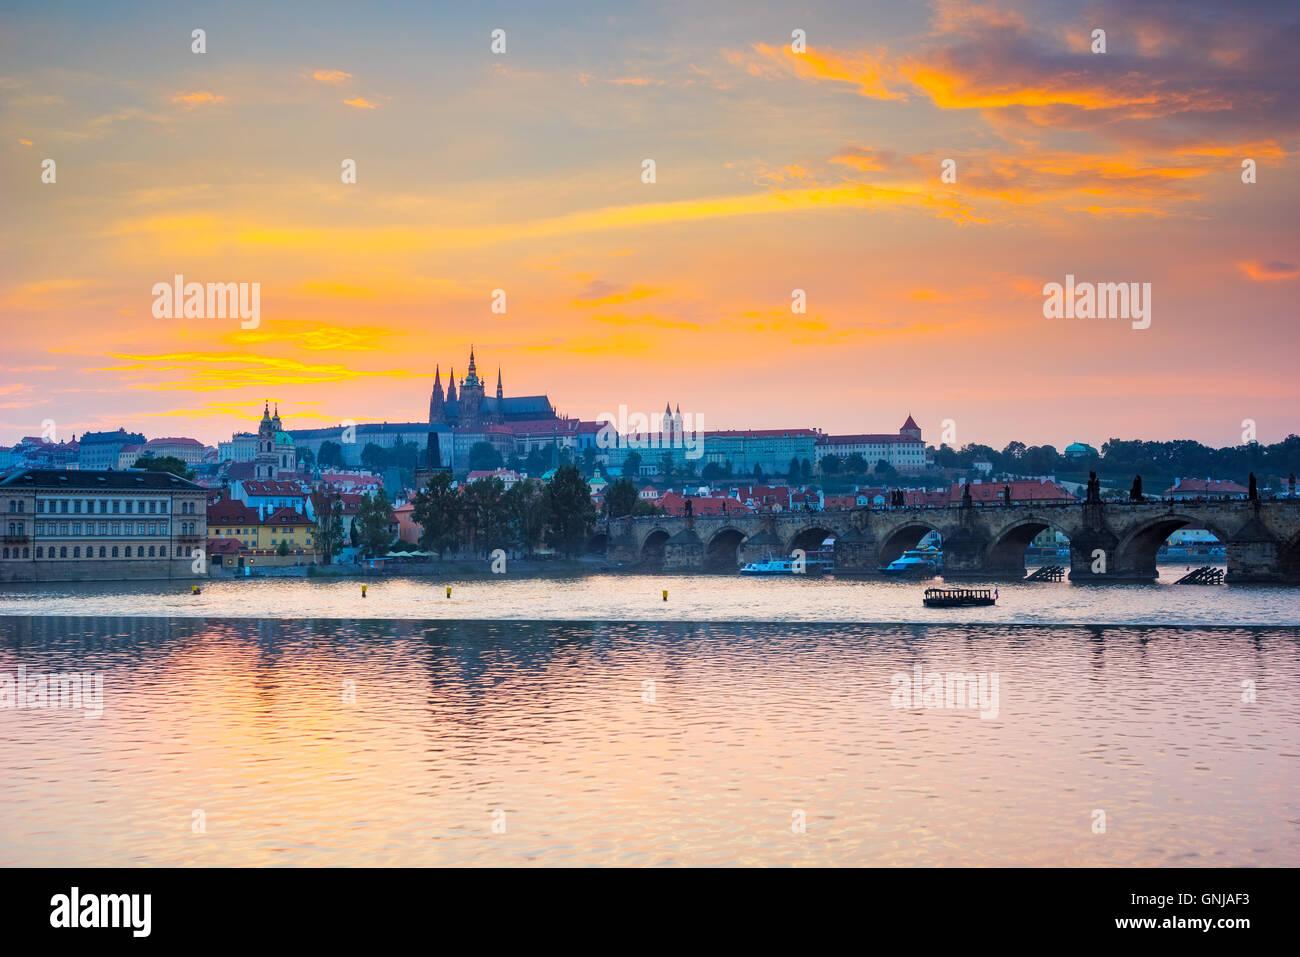 Sunset over Charles Bridge and Prague Castle from Smetanovo nabrezi along the River Vltava. Prague Czech Republic - Stock Image